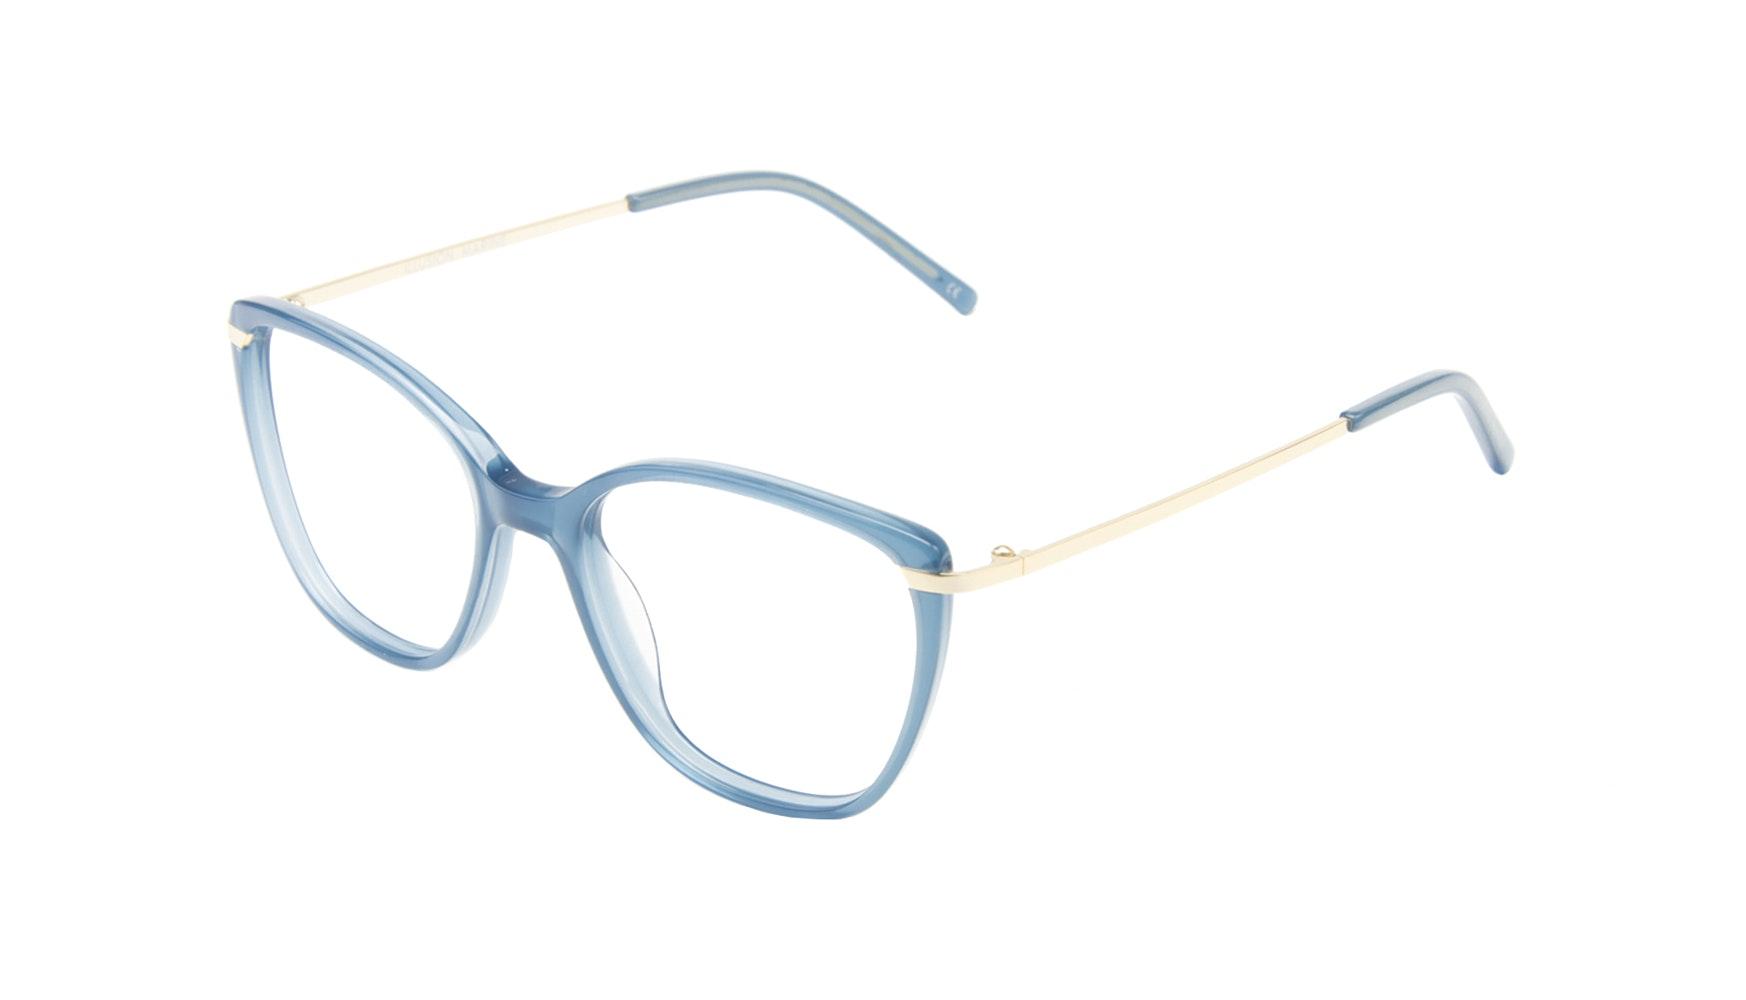 Affordable Fashion Glasses Cat Eye Rectangle Eyeglasses Women Illusion Marine Tilt